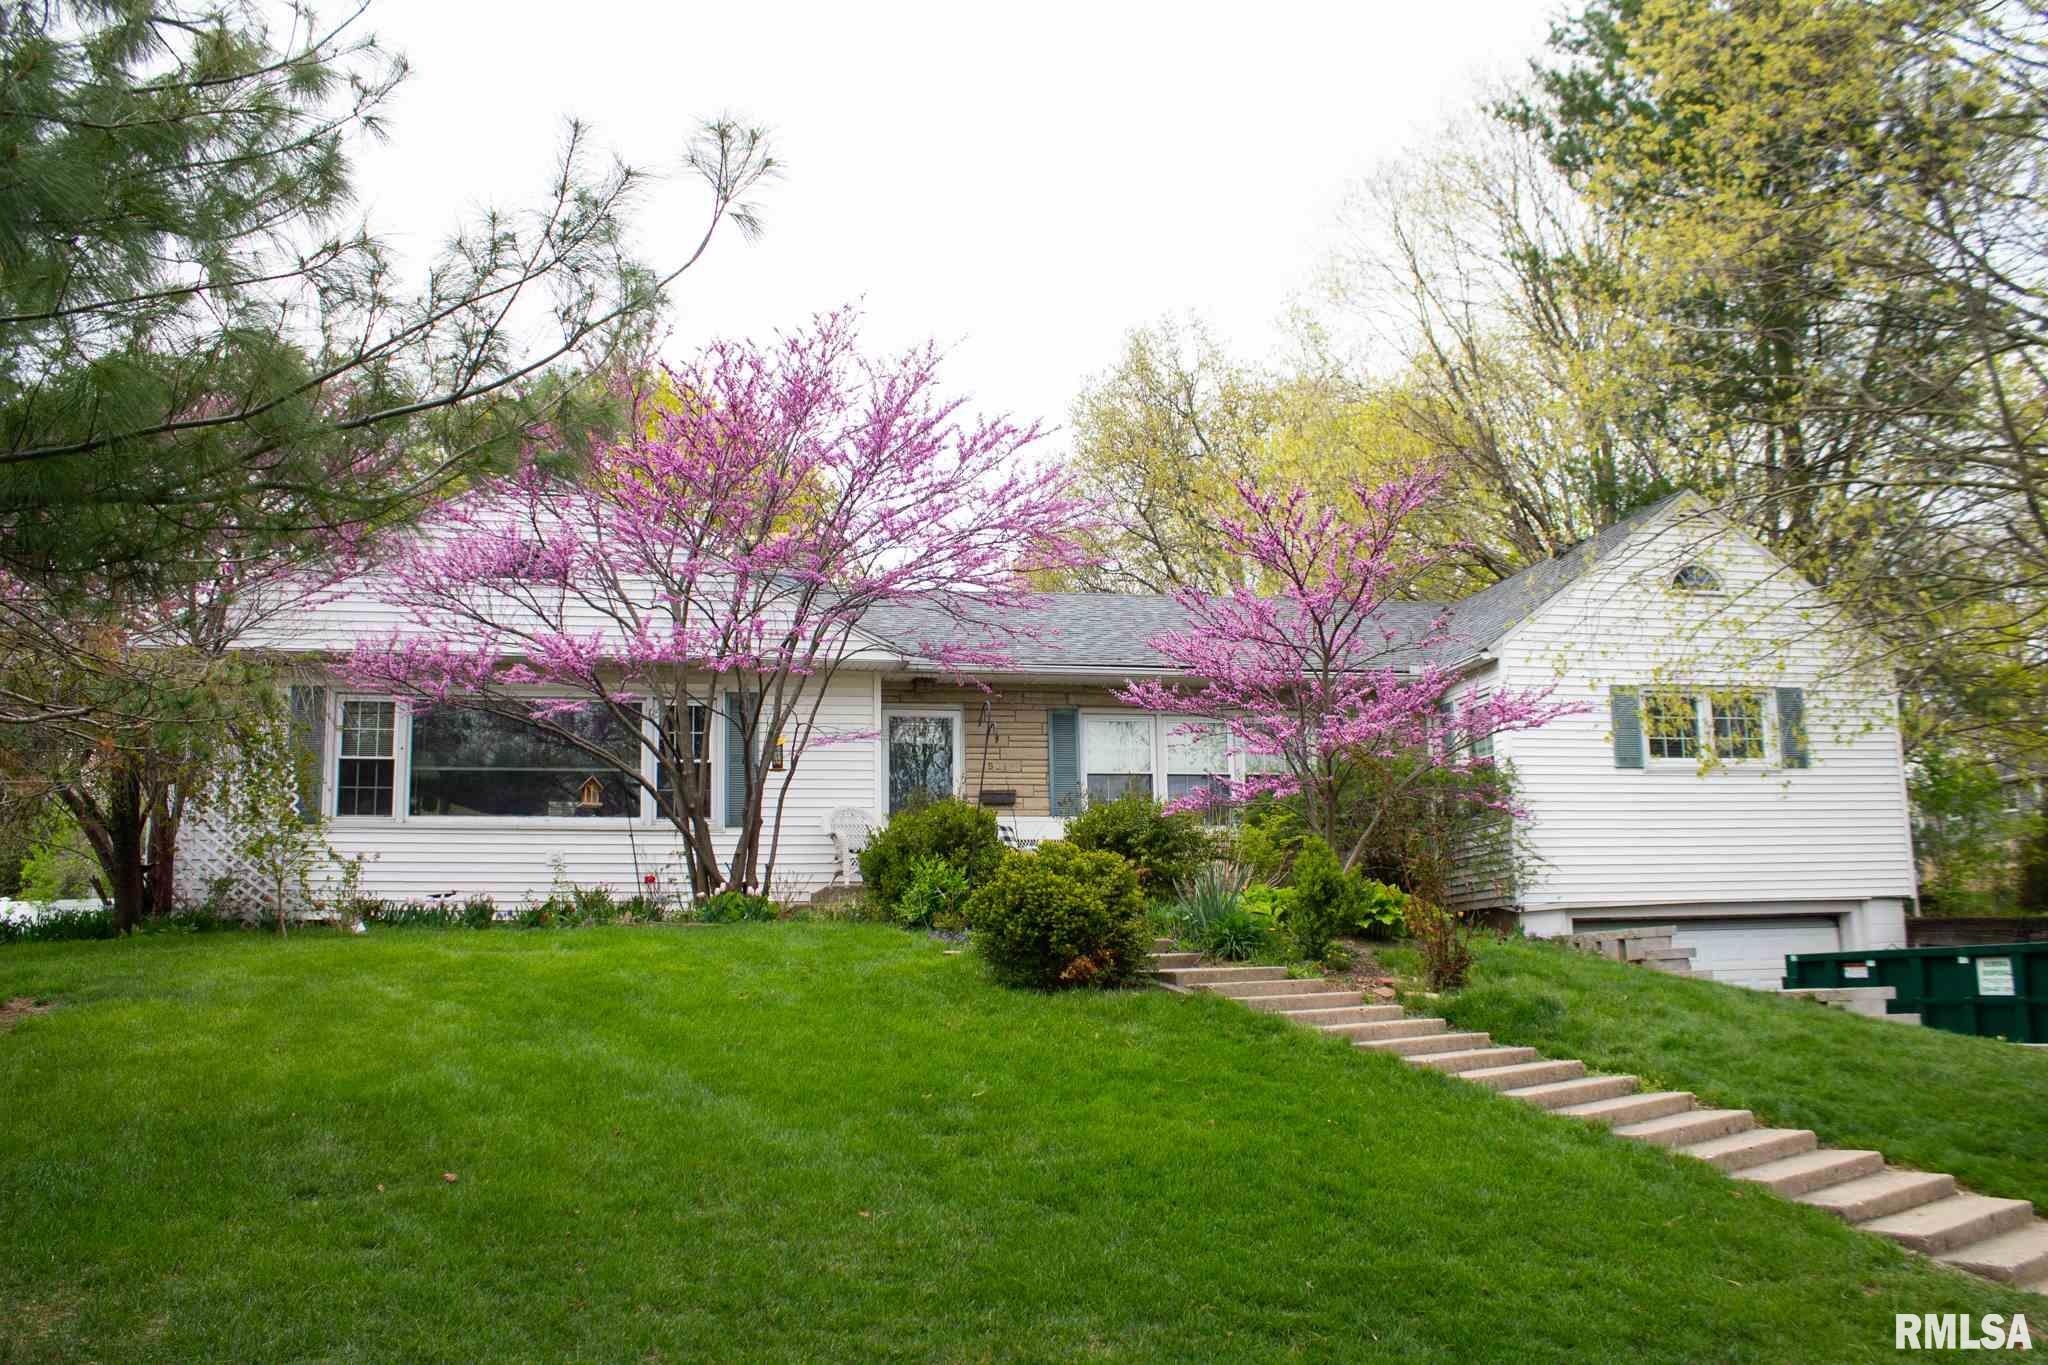 501 W BURTON Property Photo - Eureka, IL real estate listing